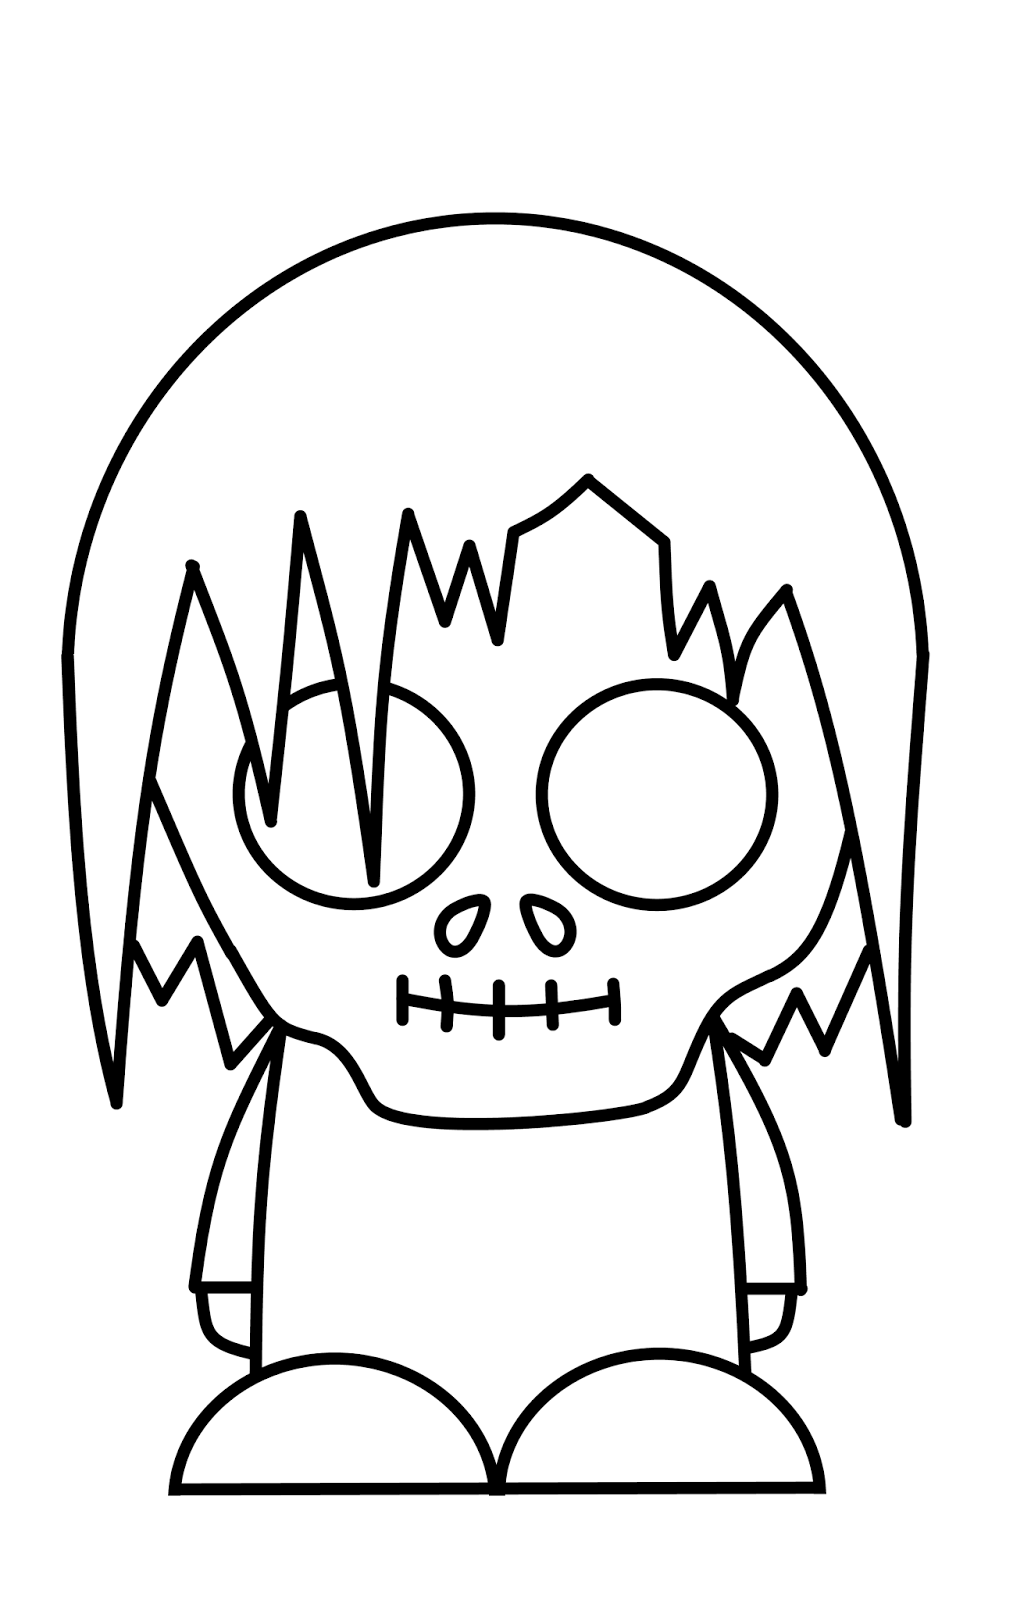 Drawn amd halloween Cartoons Search Explore  Draw